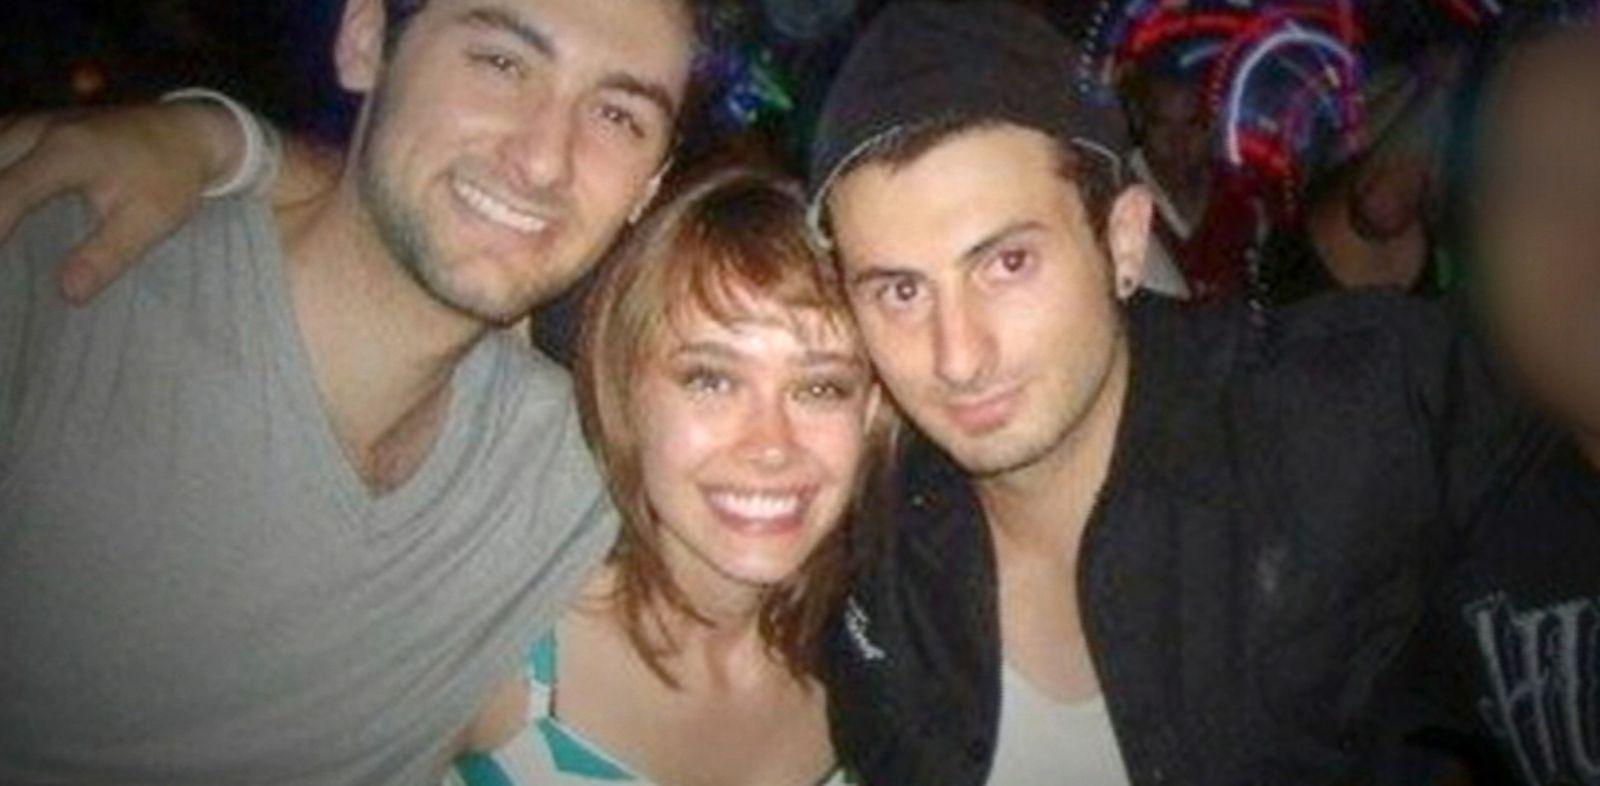 PHOTO: Gianni Belvedere, left, Ilona Flint and Salvatore Belvedere were shot to death in San Diego, Calif. in late 2013.